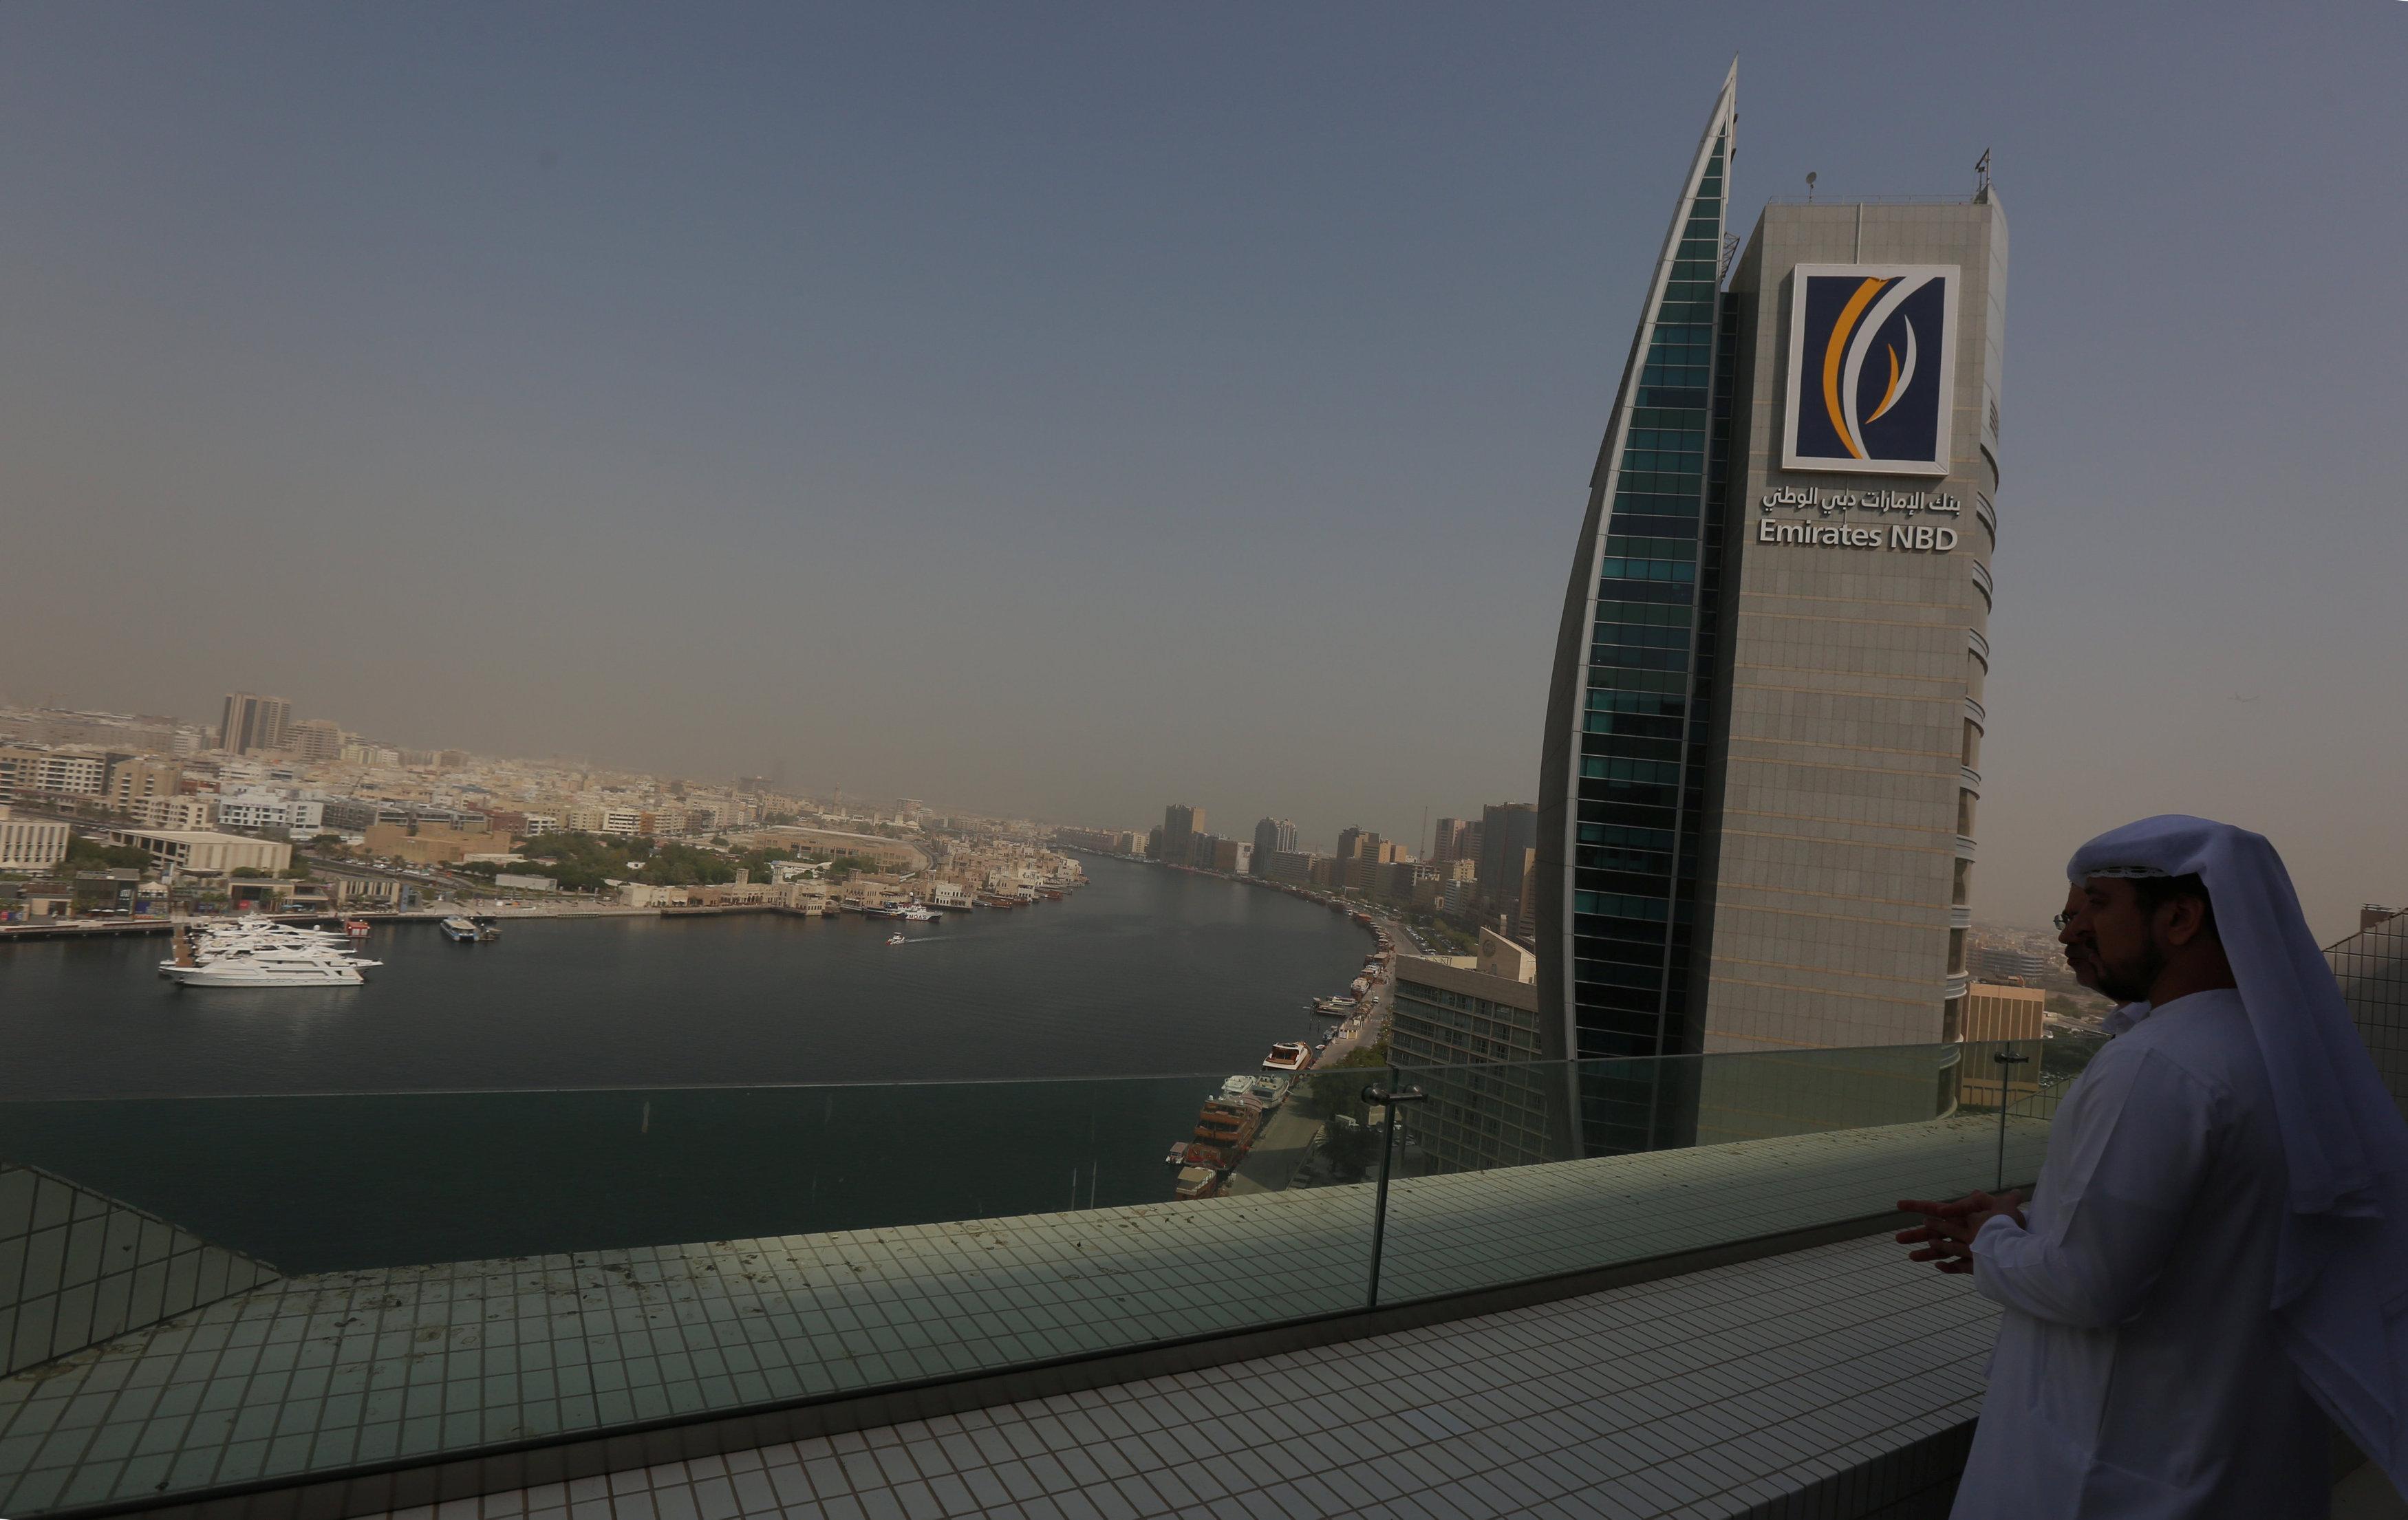 Dubai recipe for economic success looks stale as markets slump - Reuters